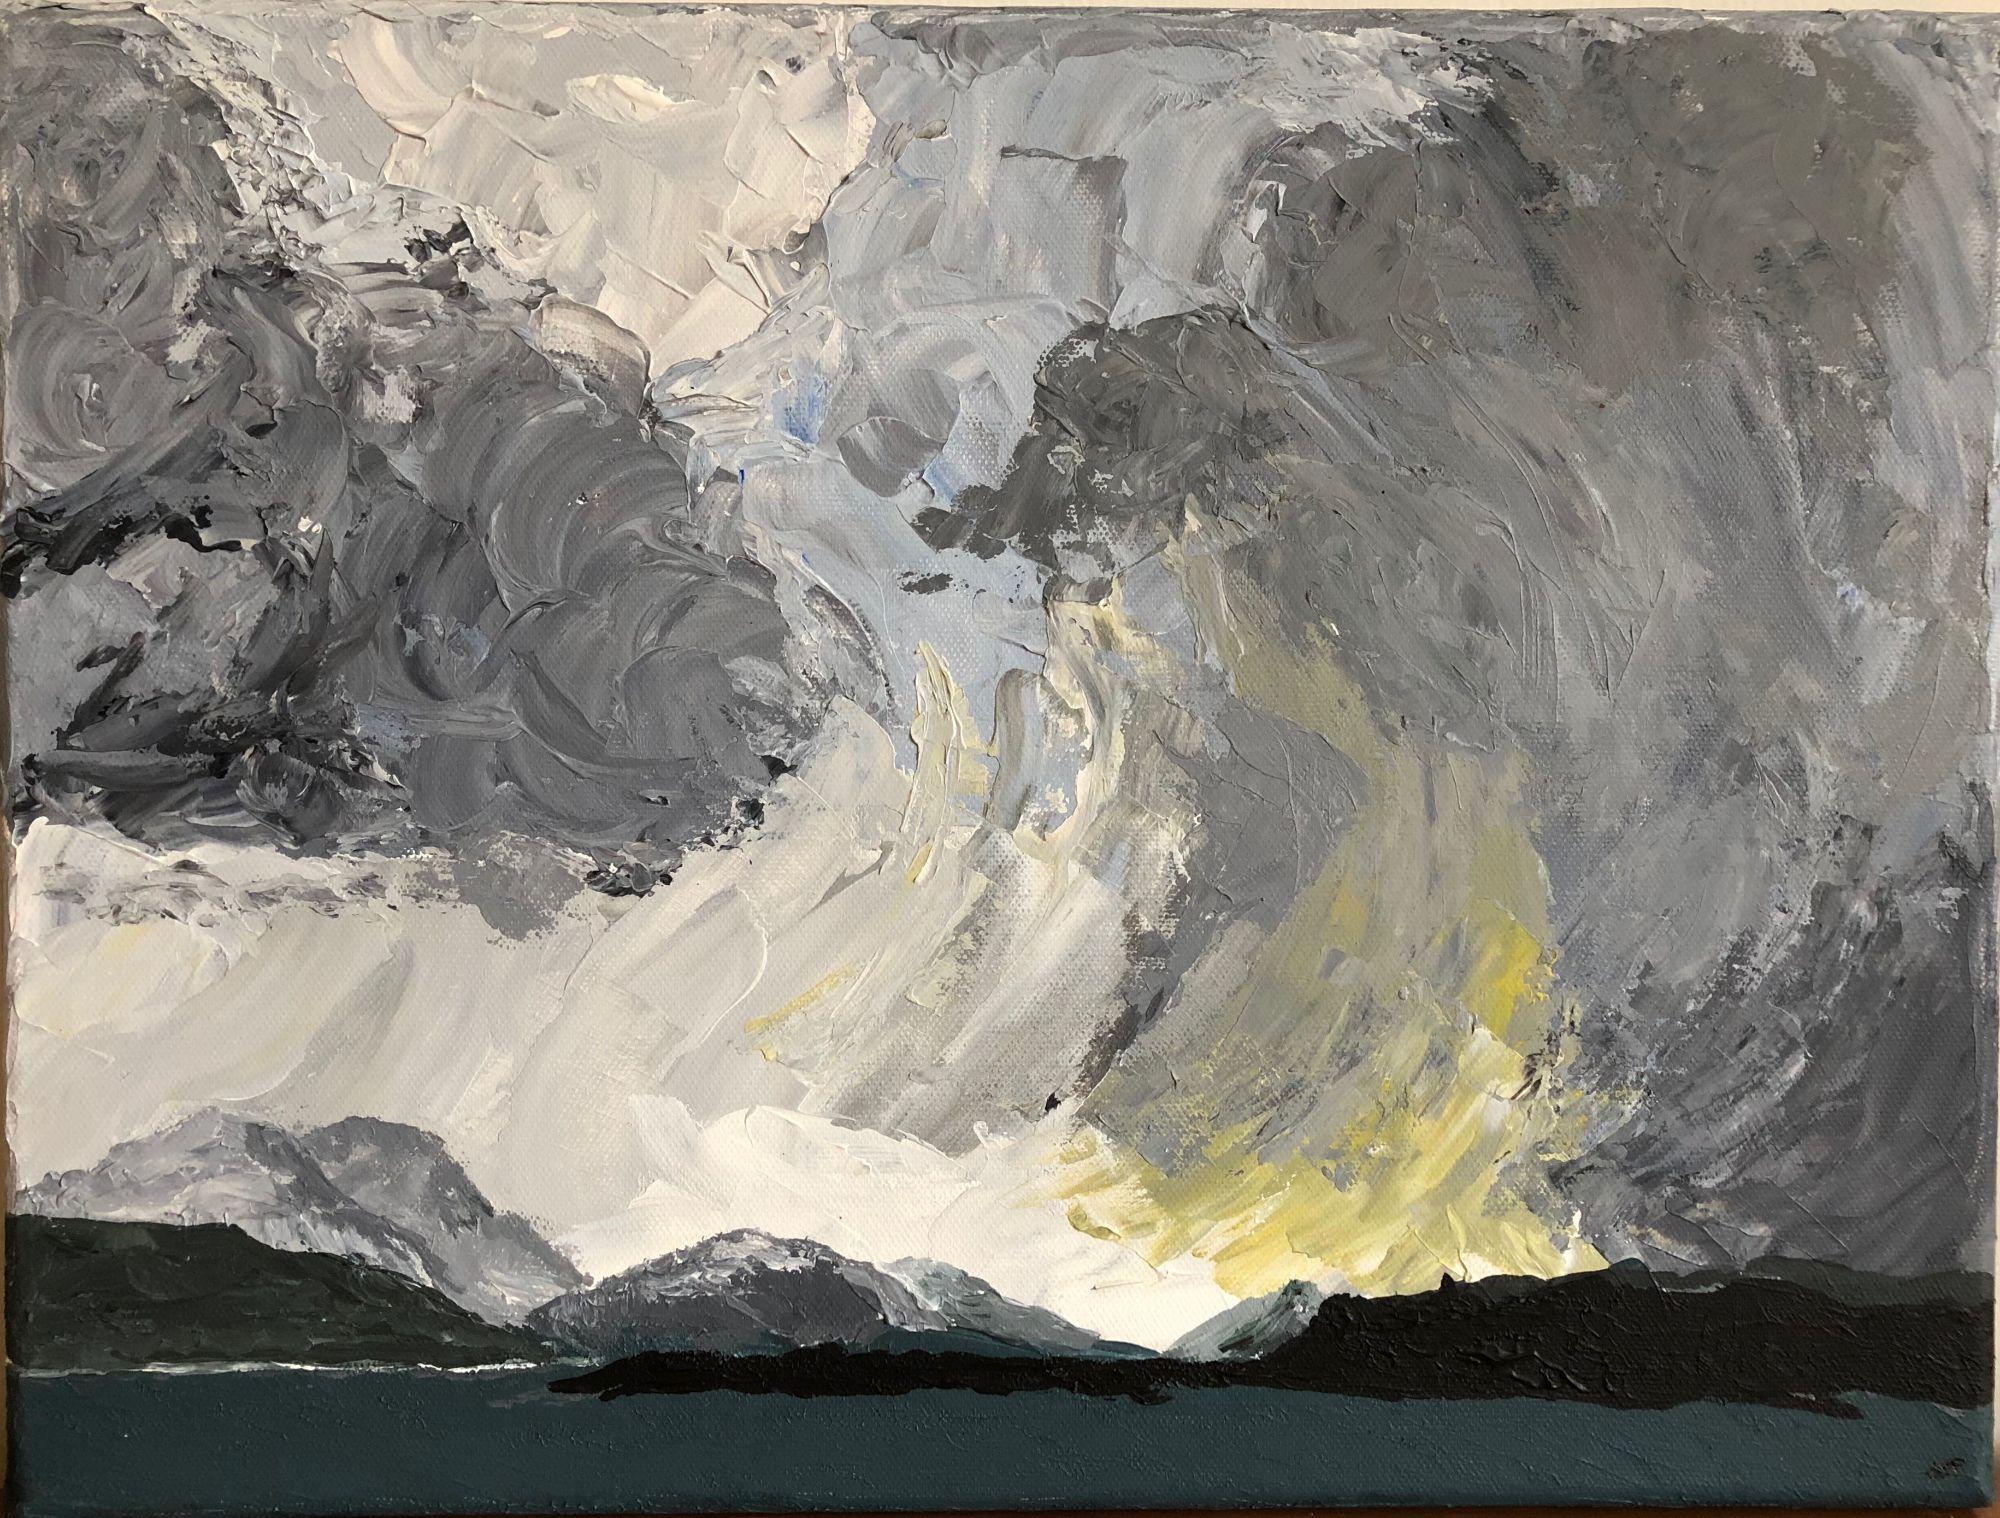 Stormy Sound  ________________________________ acrylic on stretched canvas  (30cm x 40cm)           £45